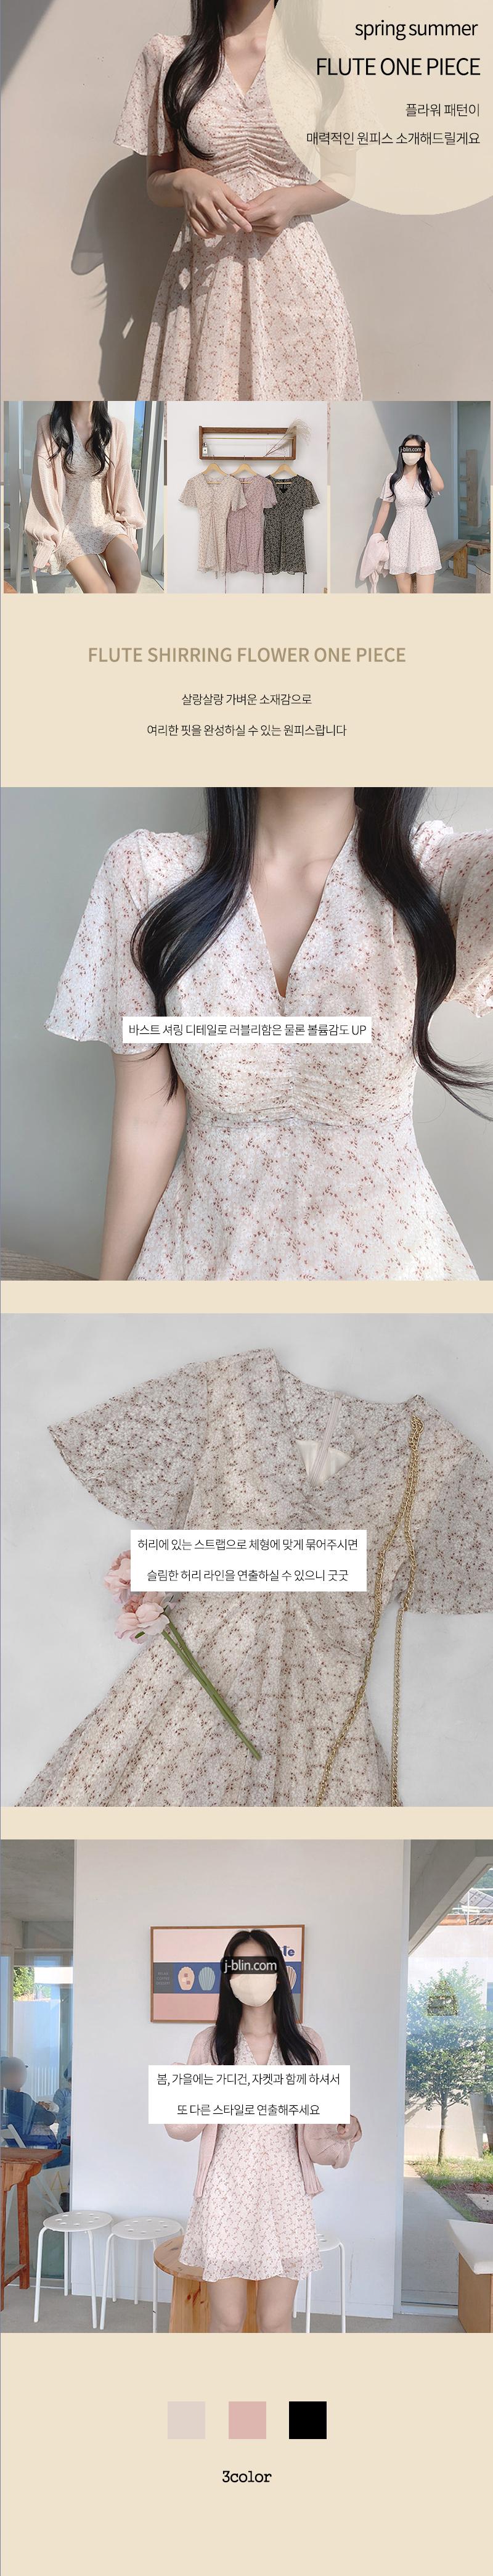 Flute shirring flower Dress